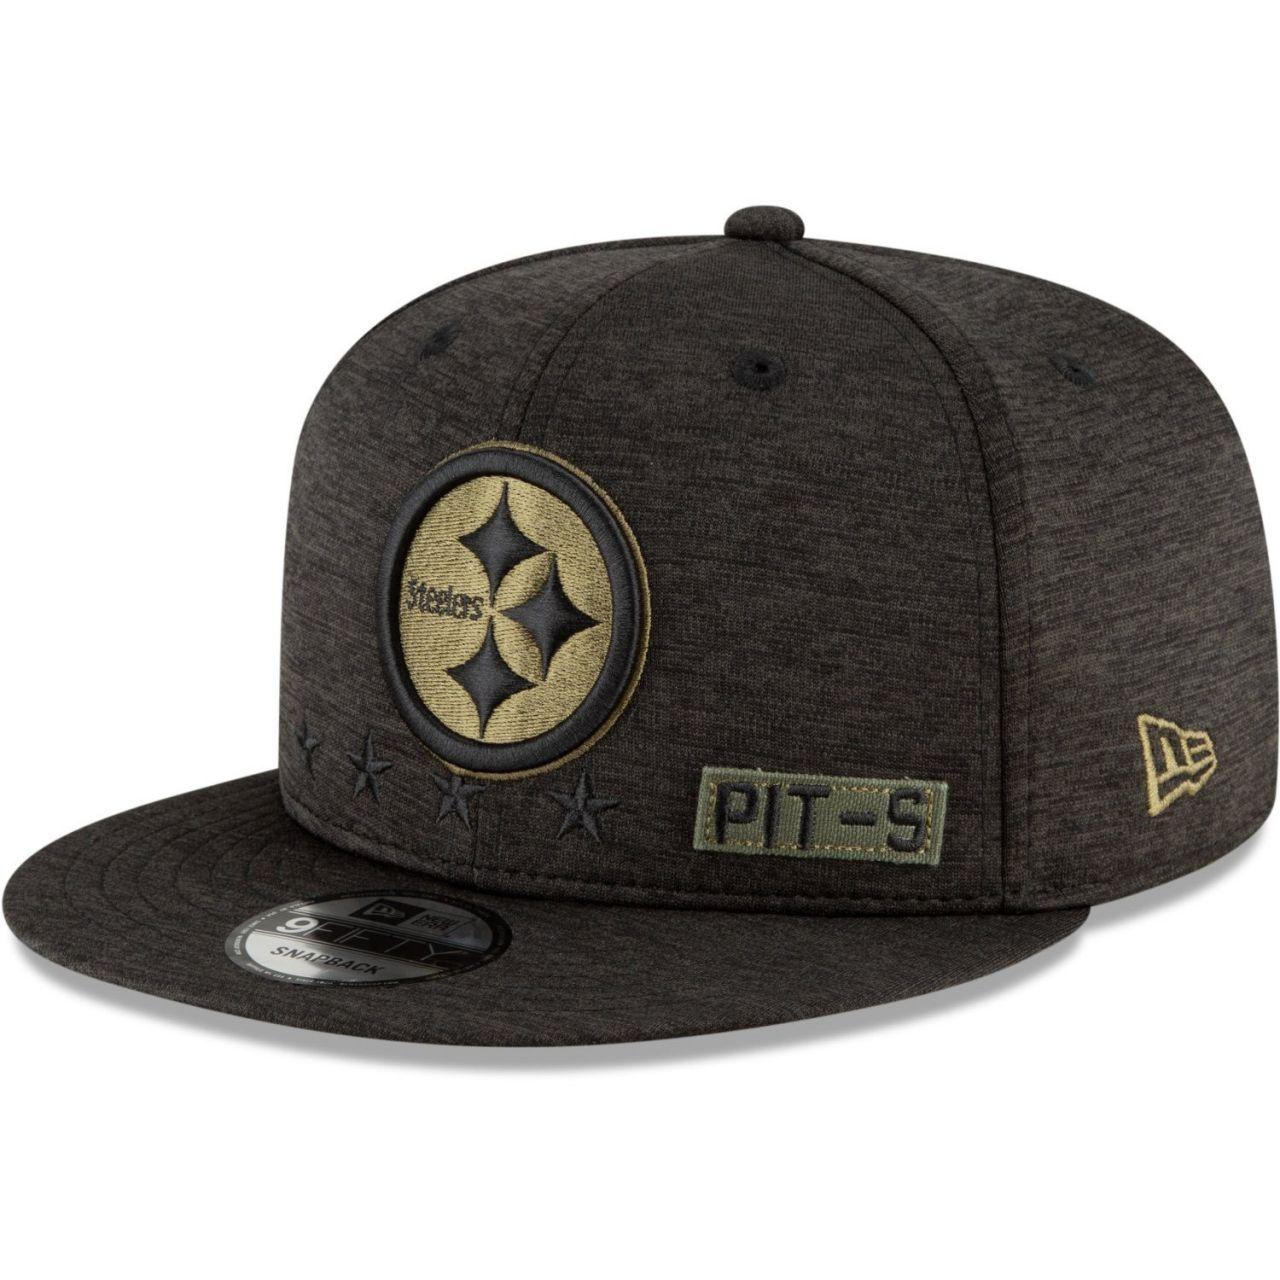 amfoo - New Era 9FIFTY Cap Salute to Service Pittsburgh Steelers